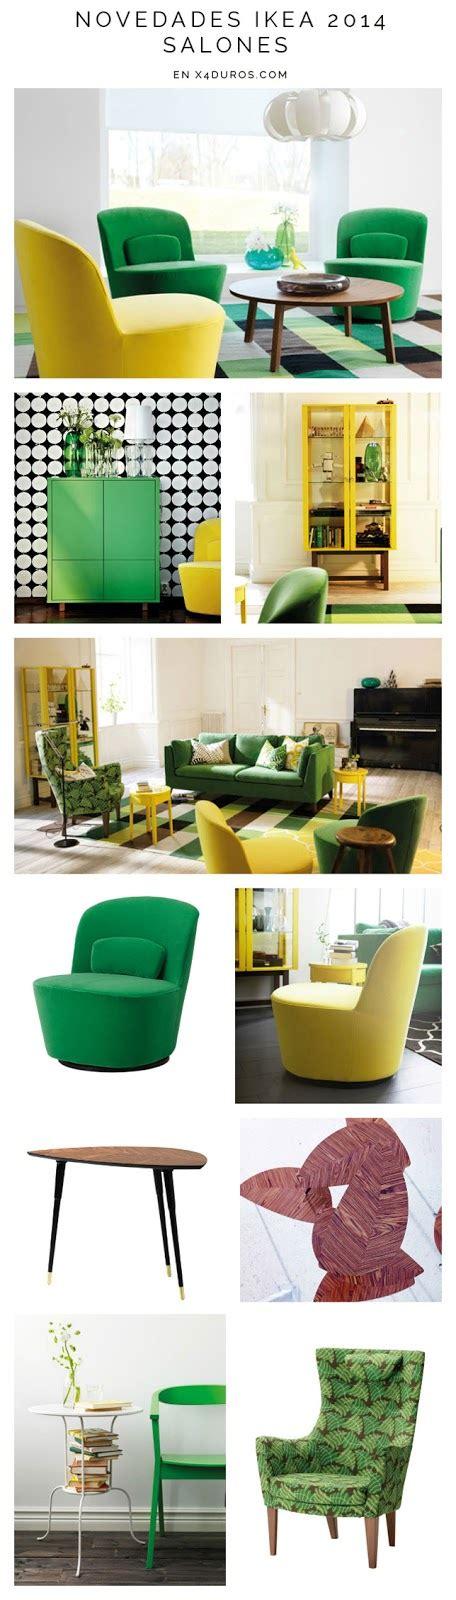 Novedades del Catálogo Ikea 2014 al completo   Ikea ...